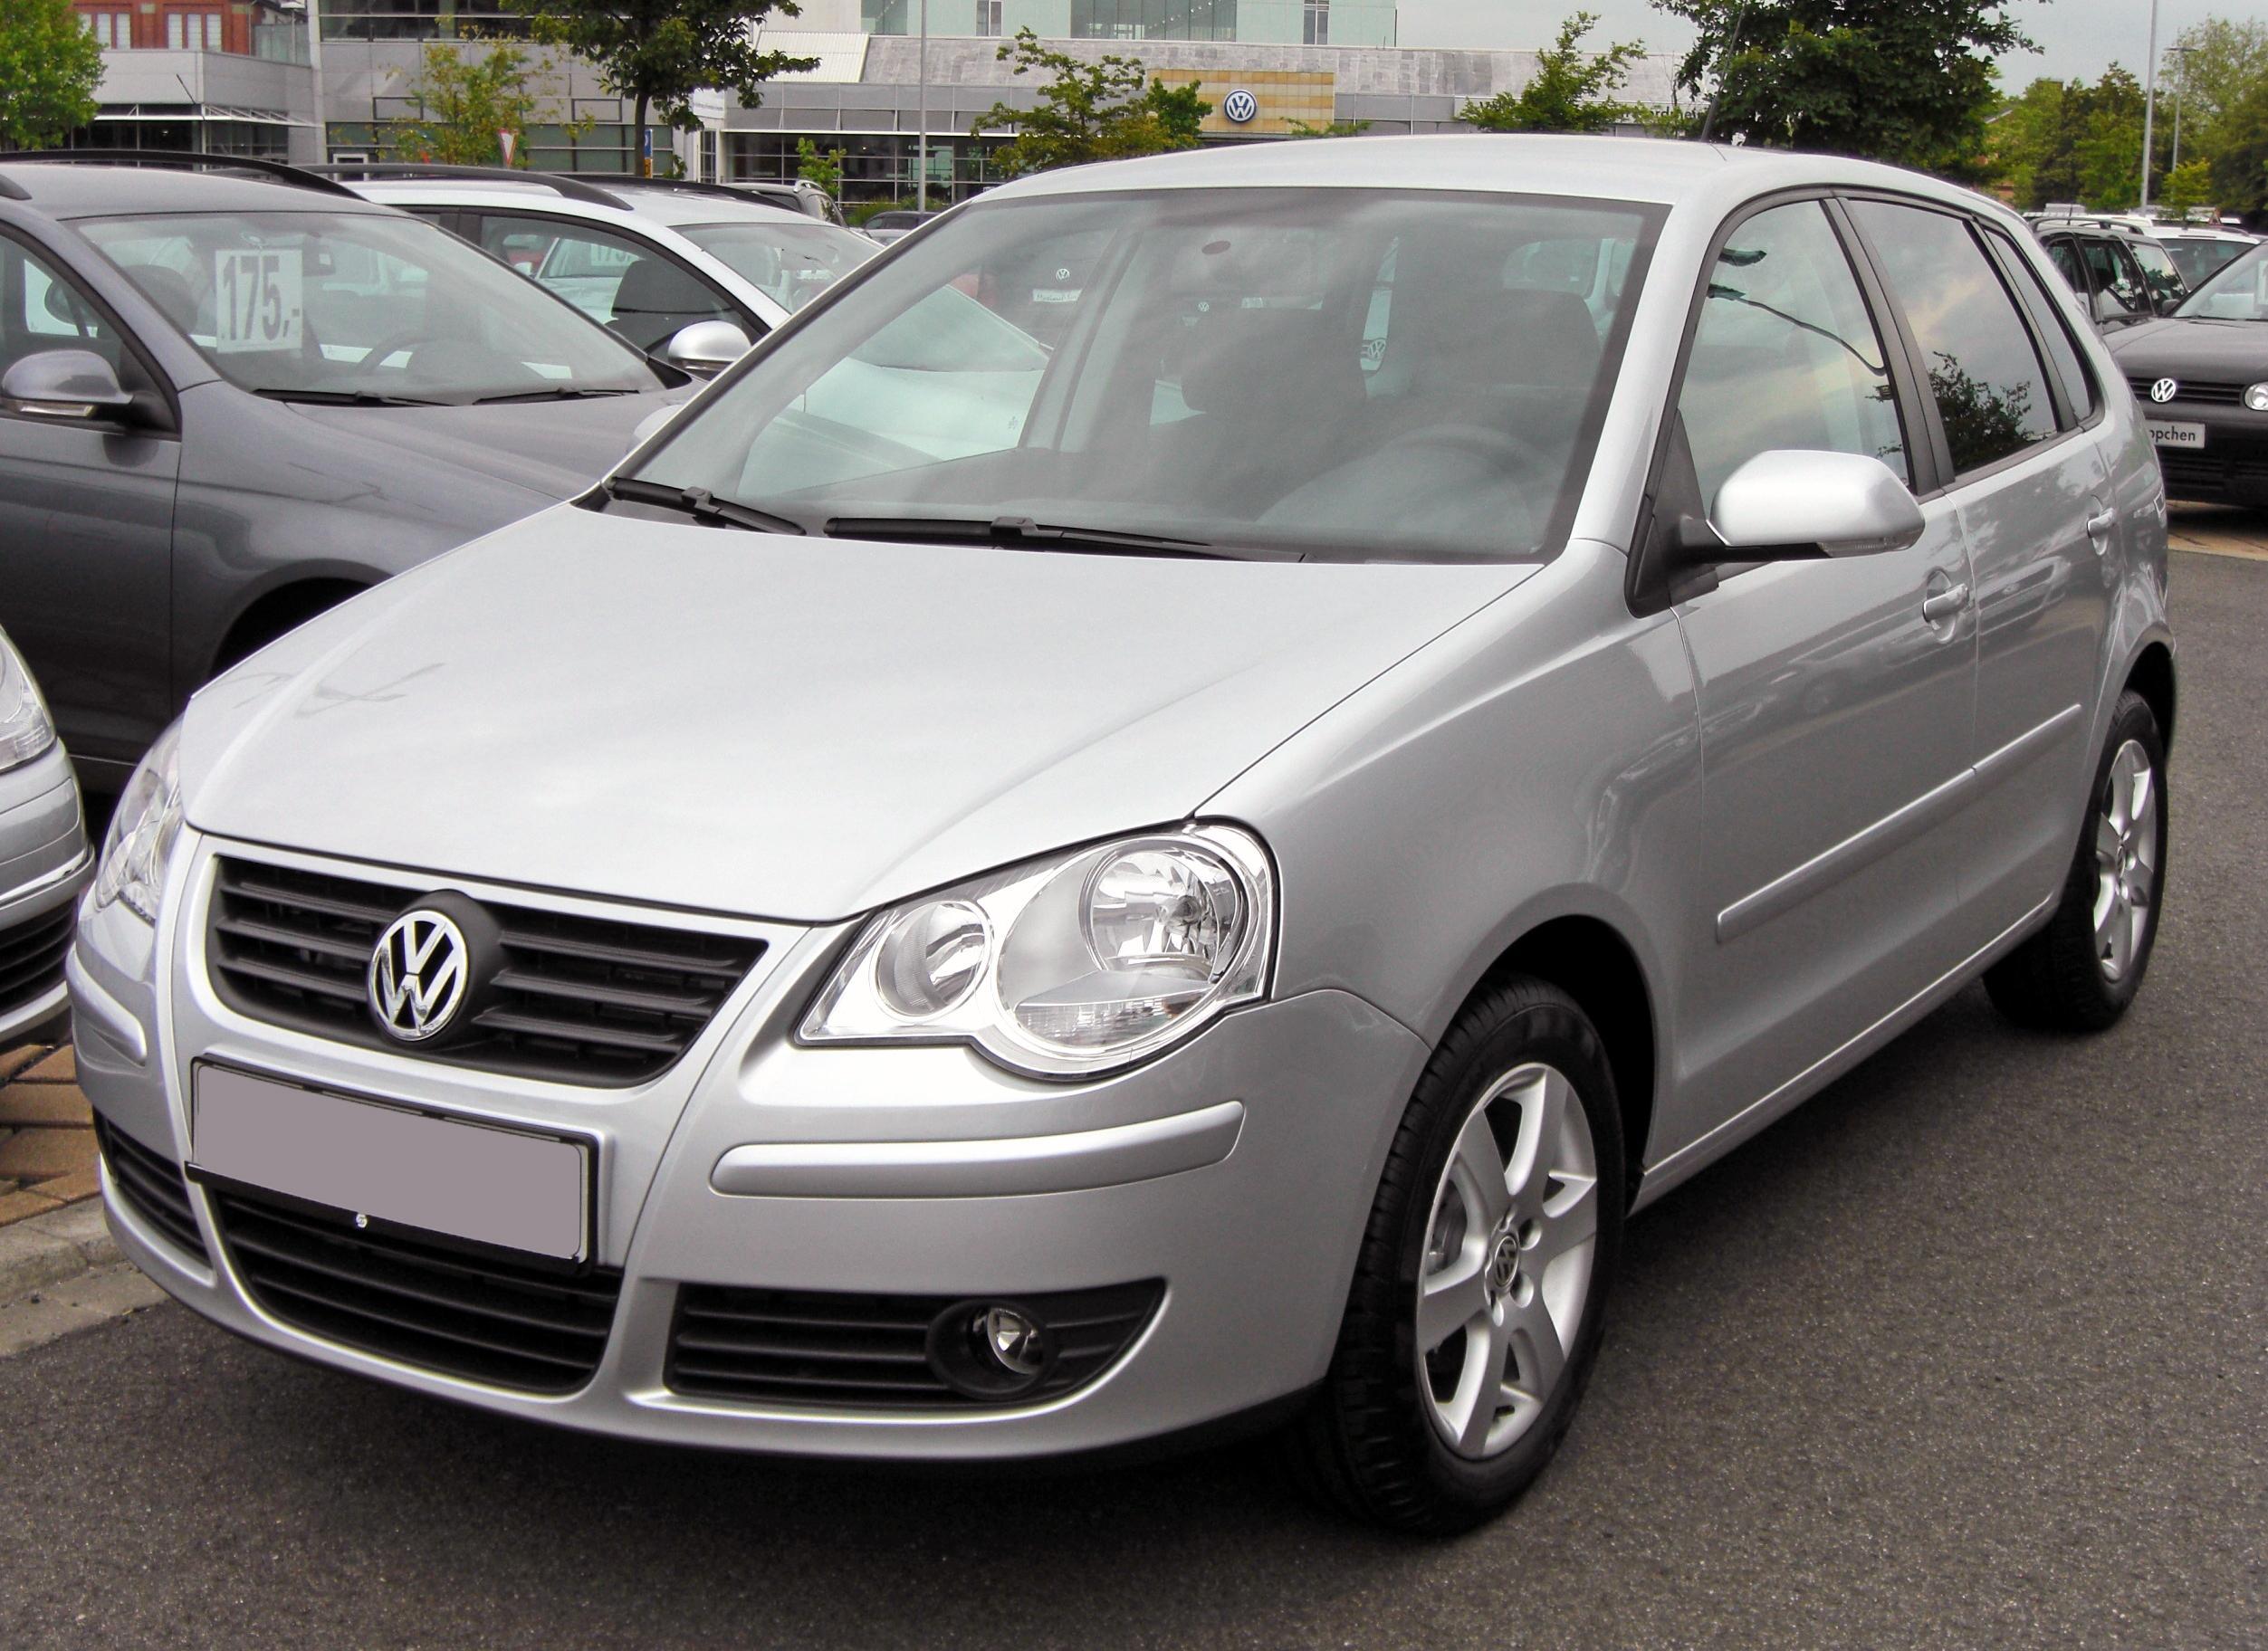 [Obrazek: VW_Polo_IV_Facelift_Silver_Edition_20090620_front.JPG]